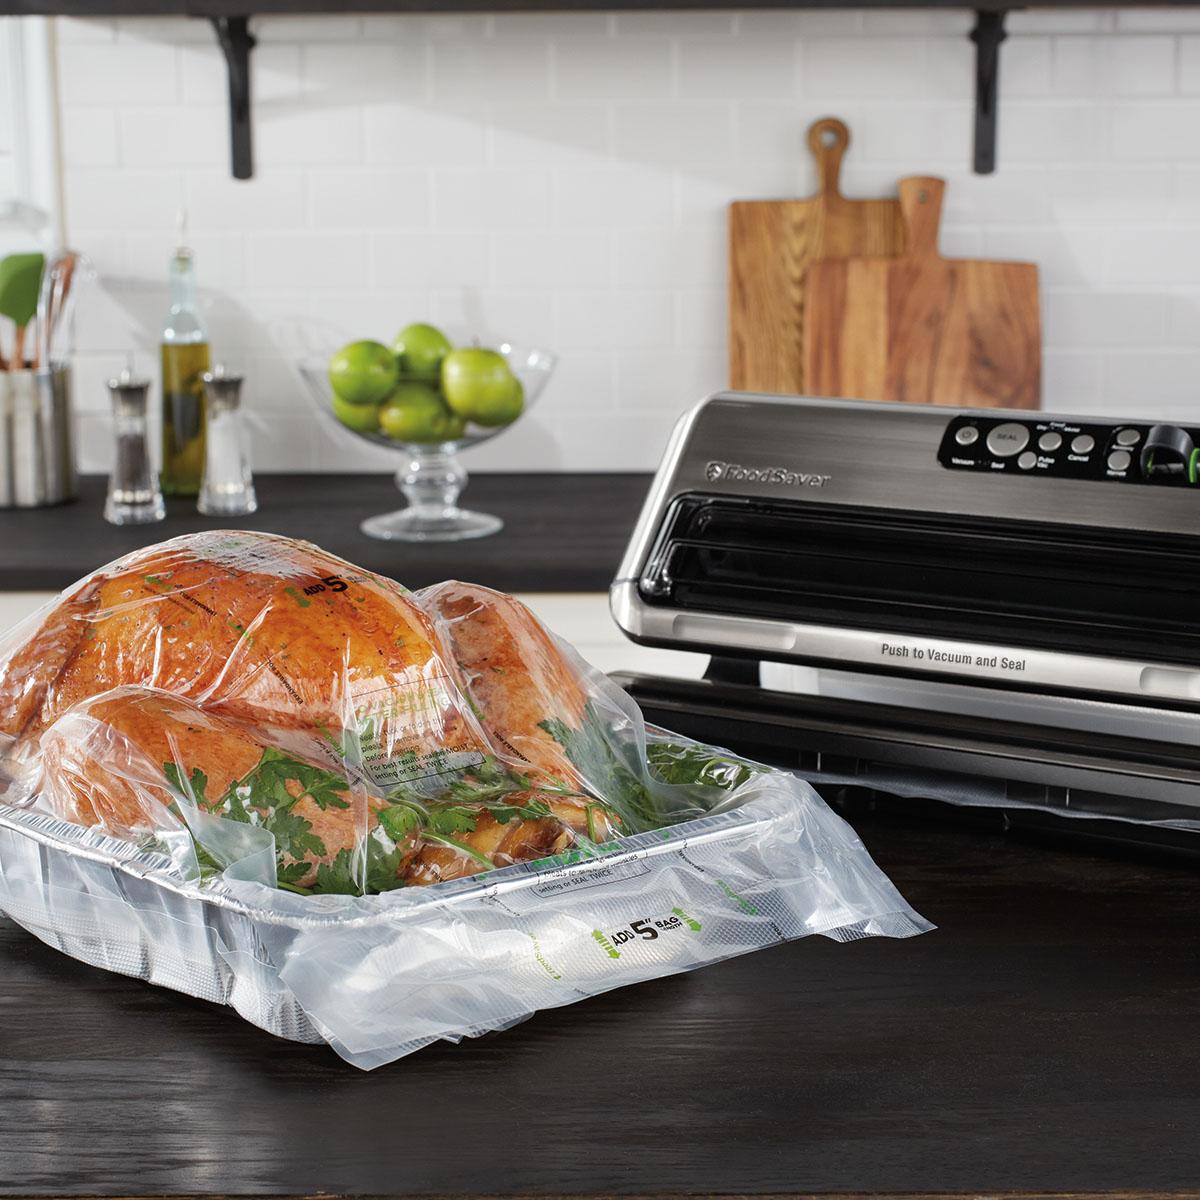 The FoodSaver FM5460 2-in-1 Food Preservation System FM5460-DTC 7